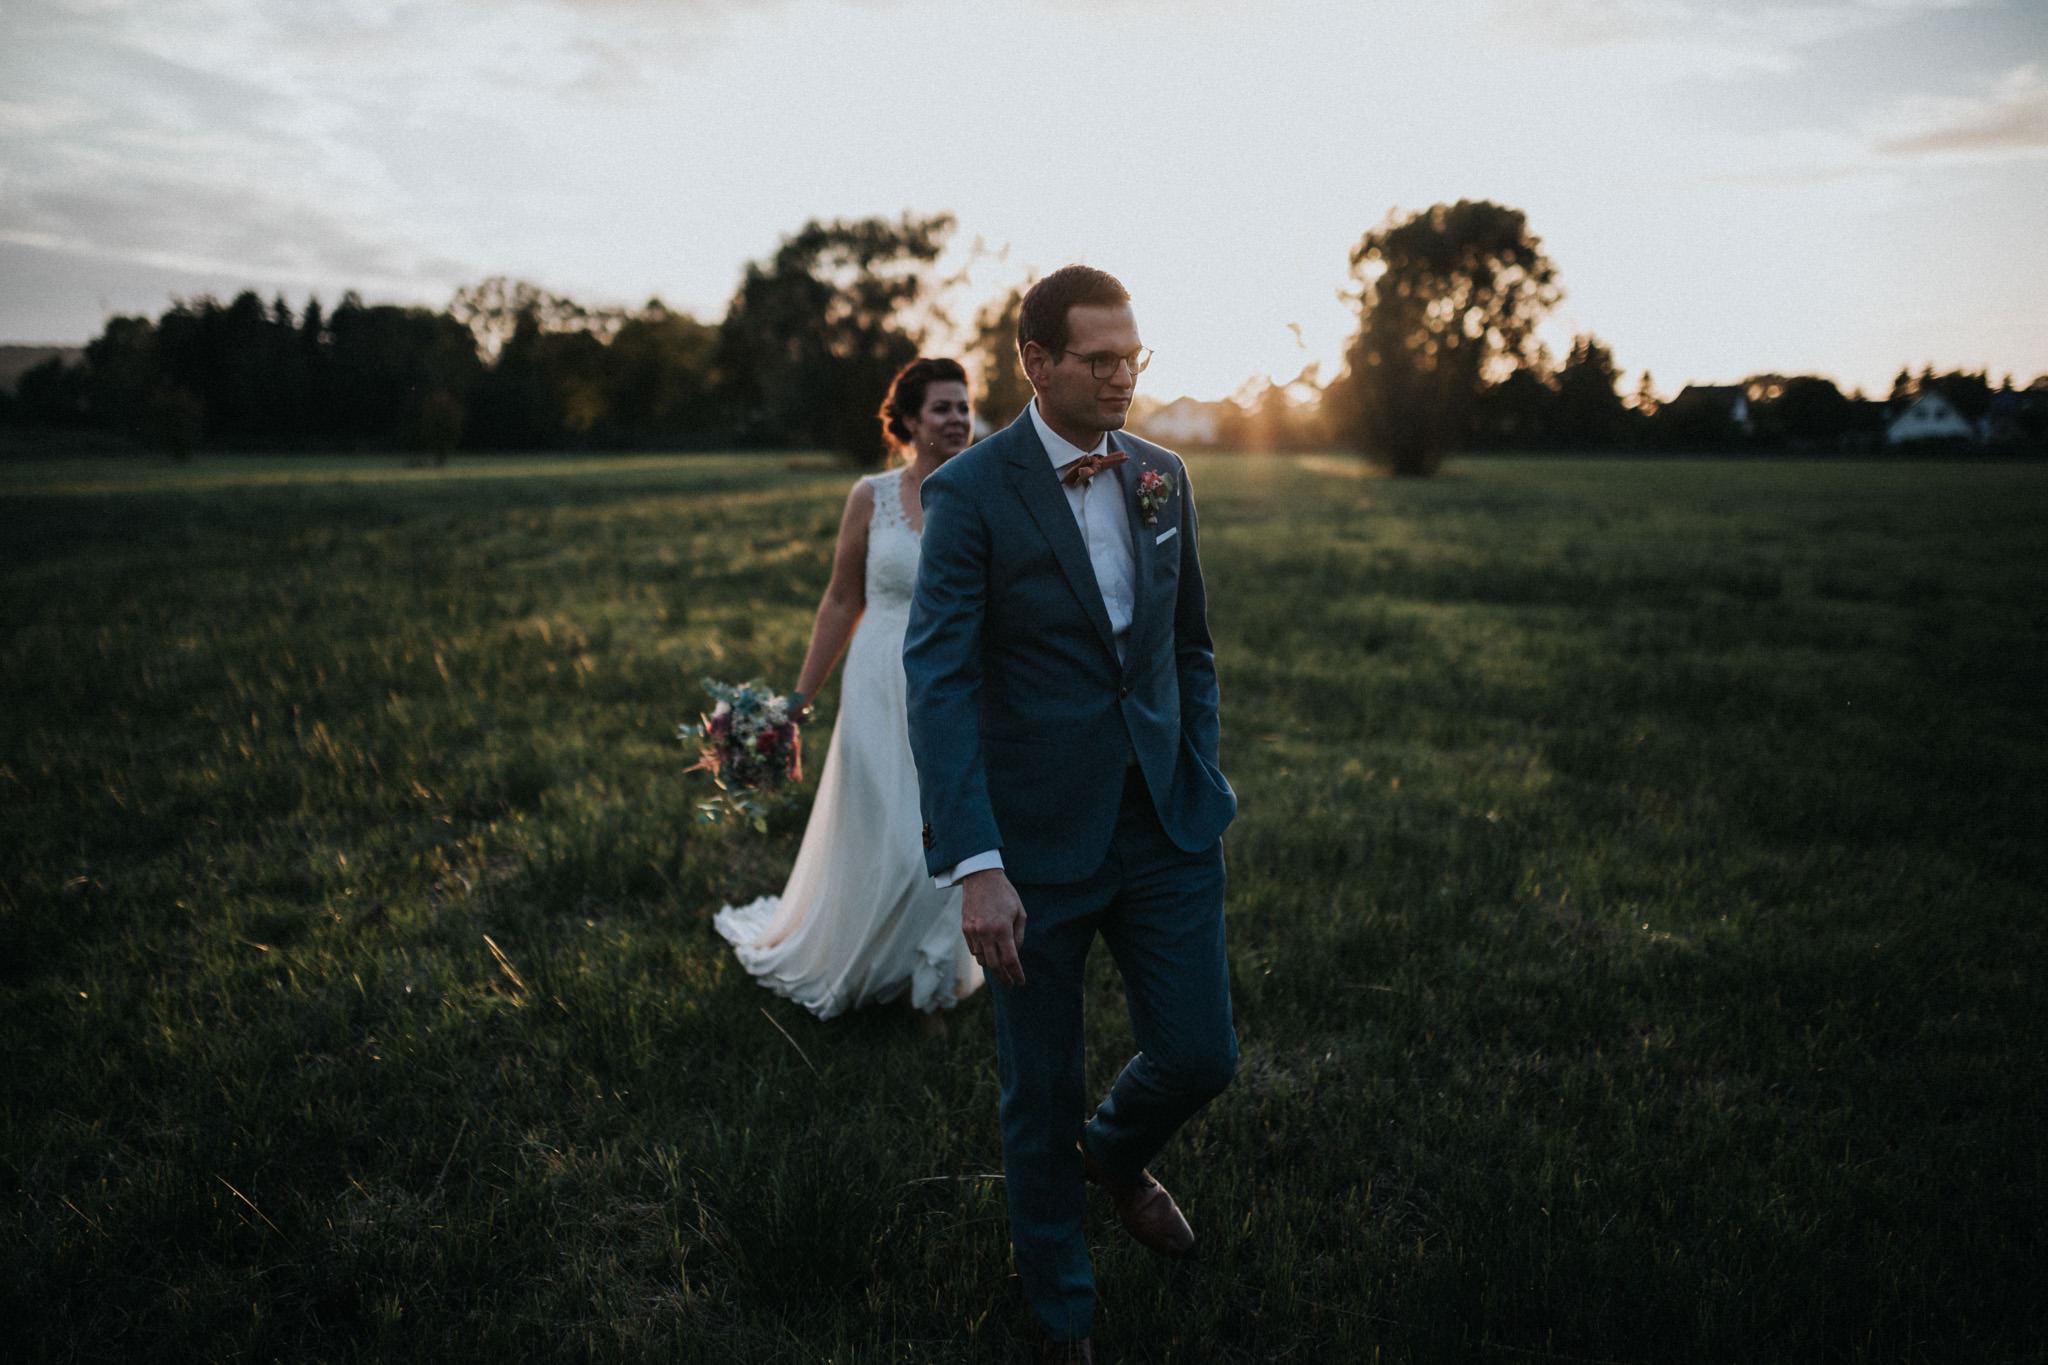 Hochzeitsfotograf-Homberg-60.jpg